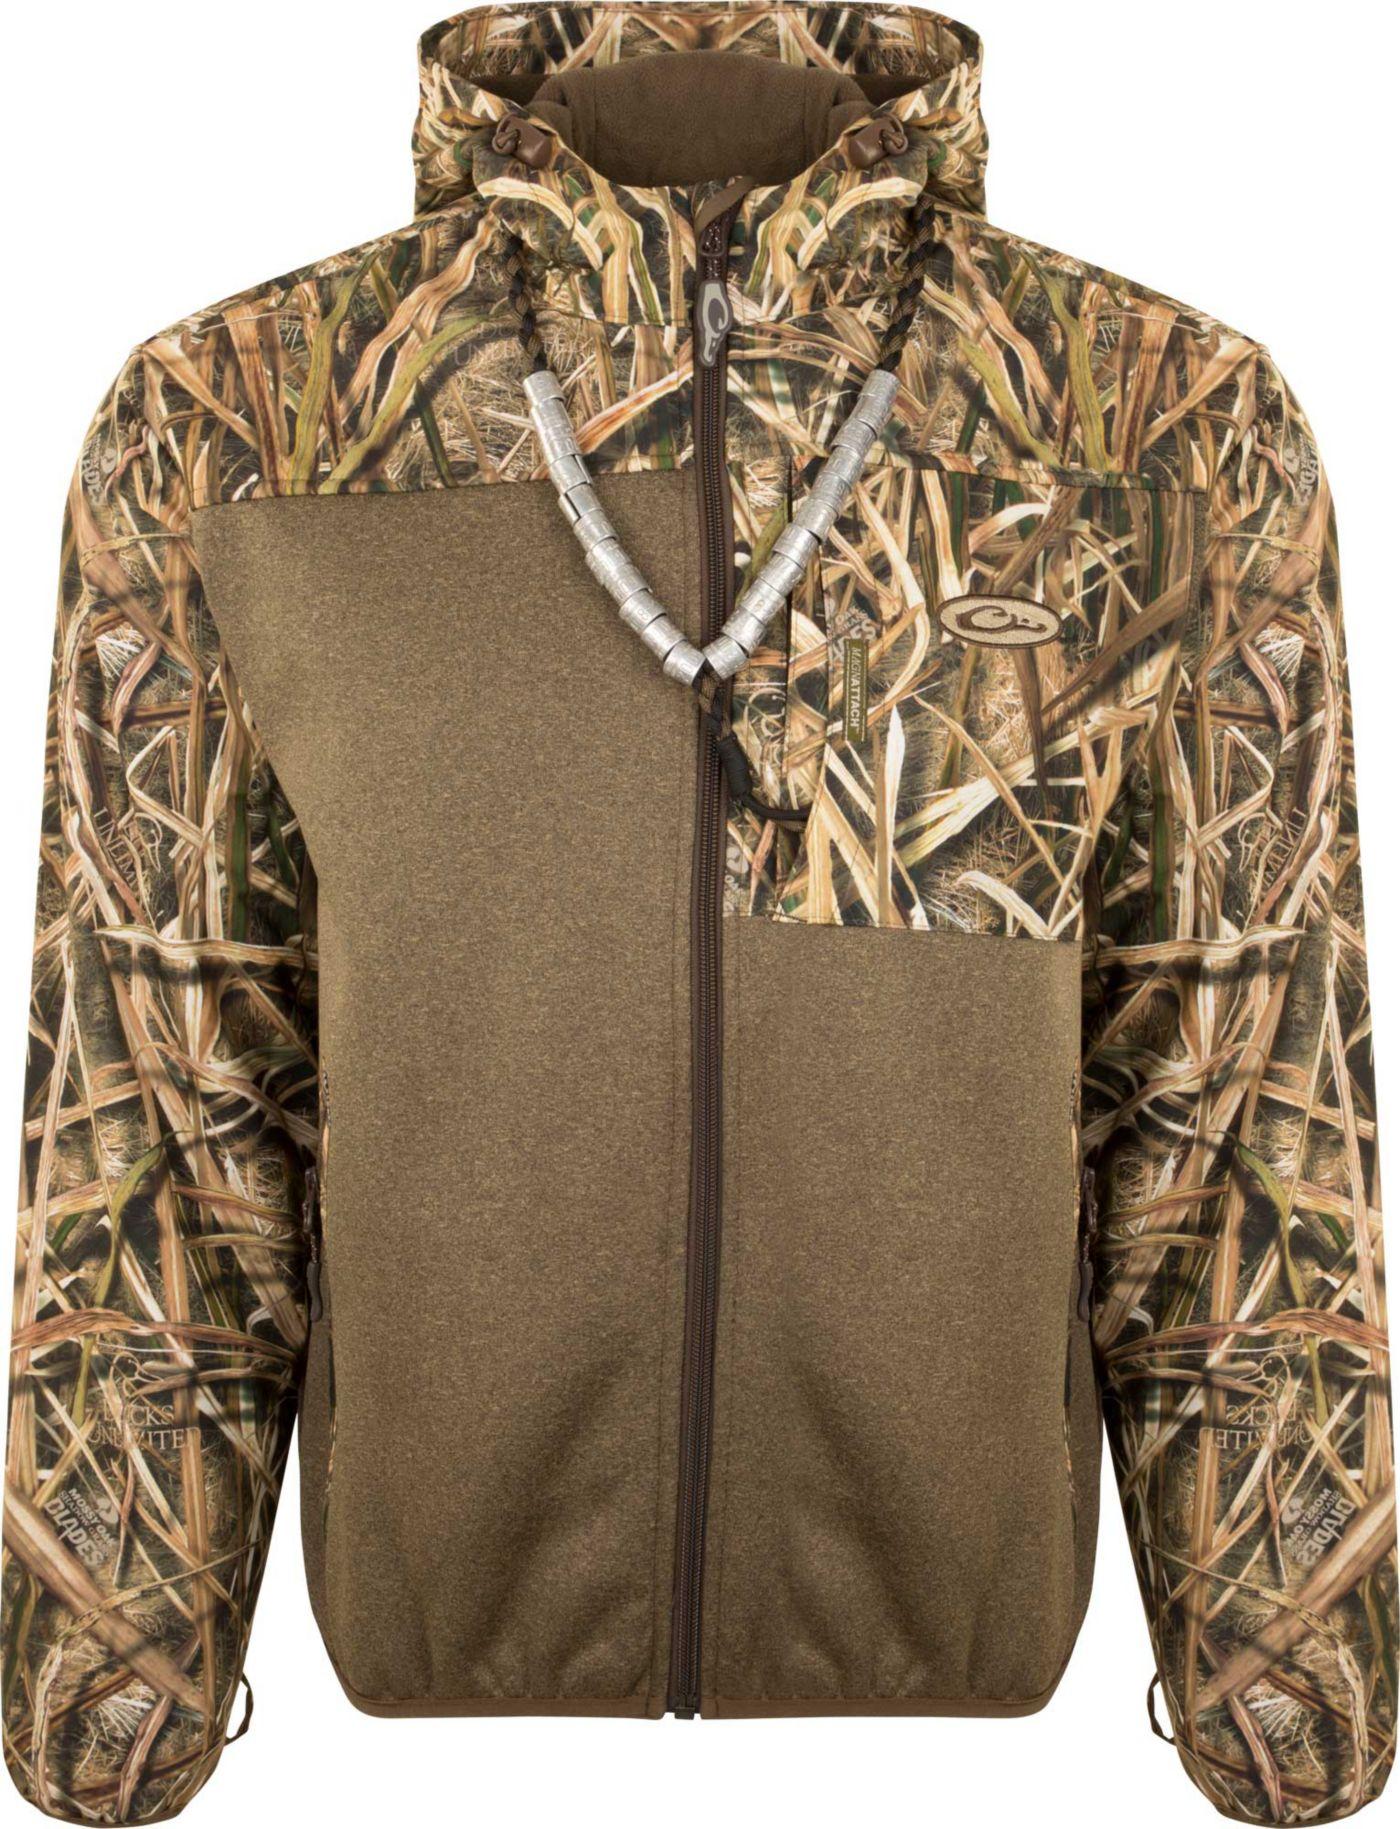 Drake Waterfowl Endurance Hybrid Liner Hunting Full Zip Hooded Hunting Jacket